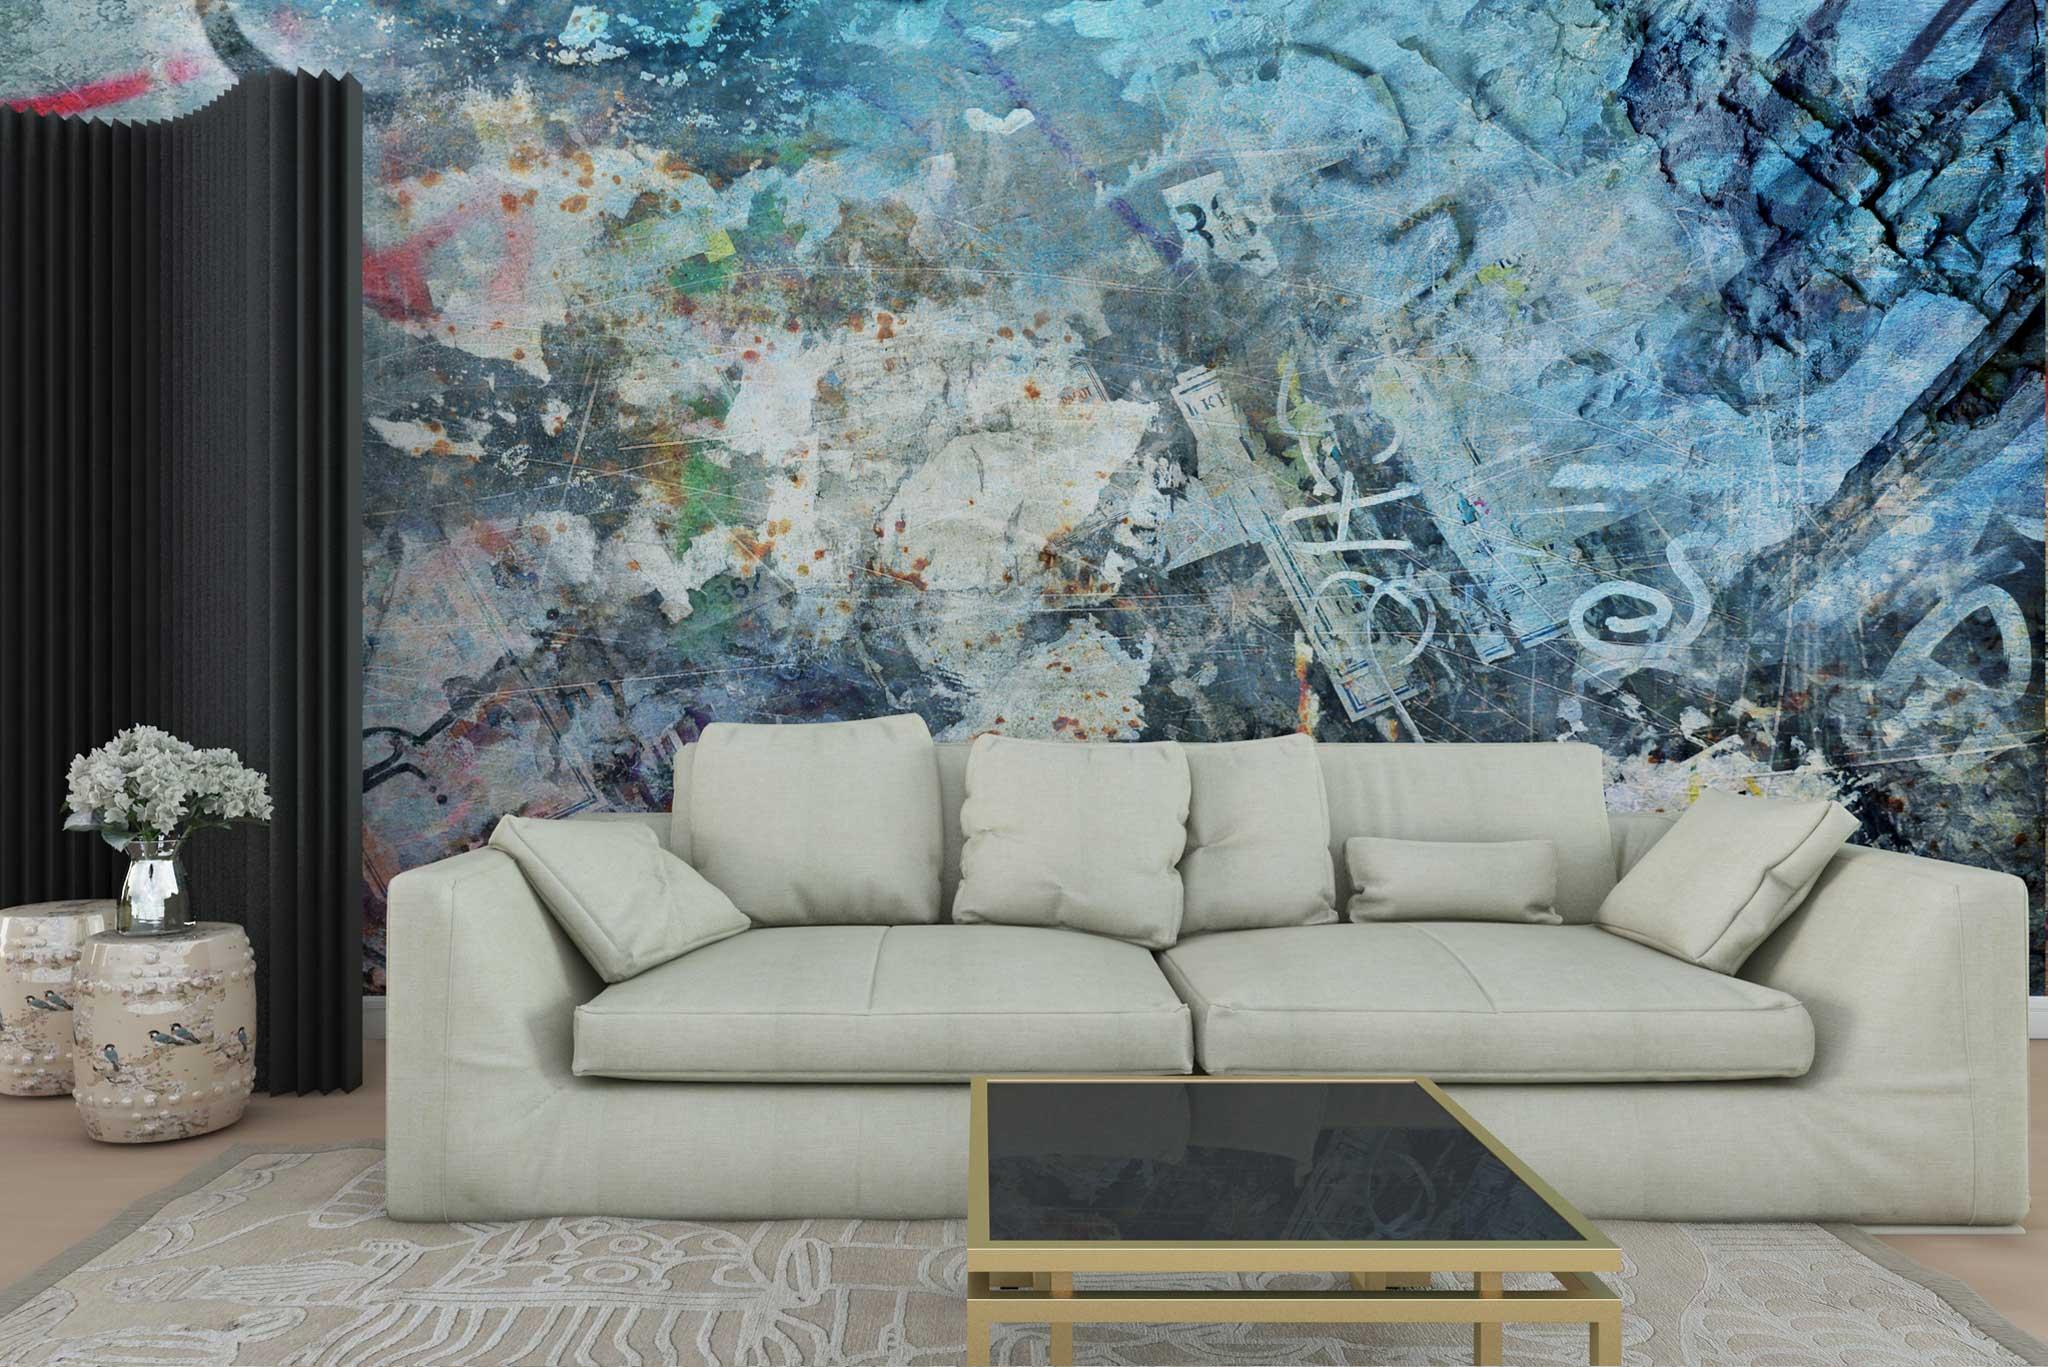 tapet-fototapet-personalizat-comanda-bucuresti-pictura-abstracta-graffitti-albastru-perete-lux-special